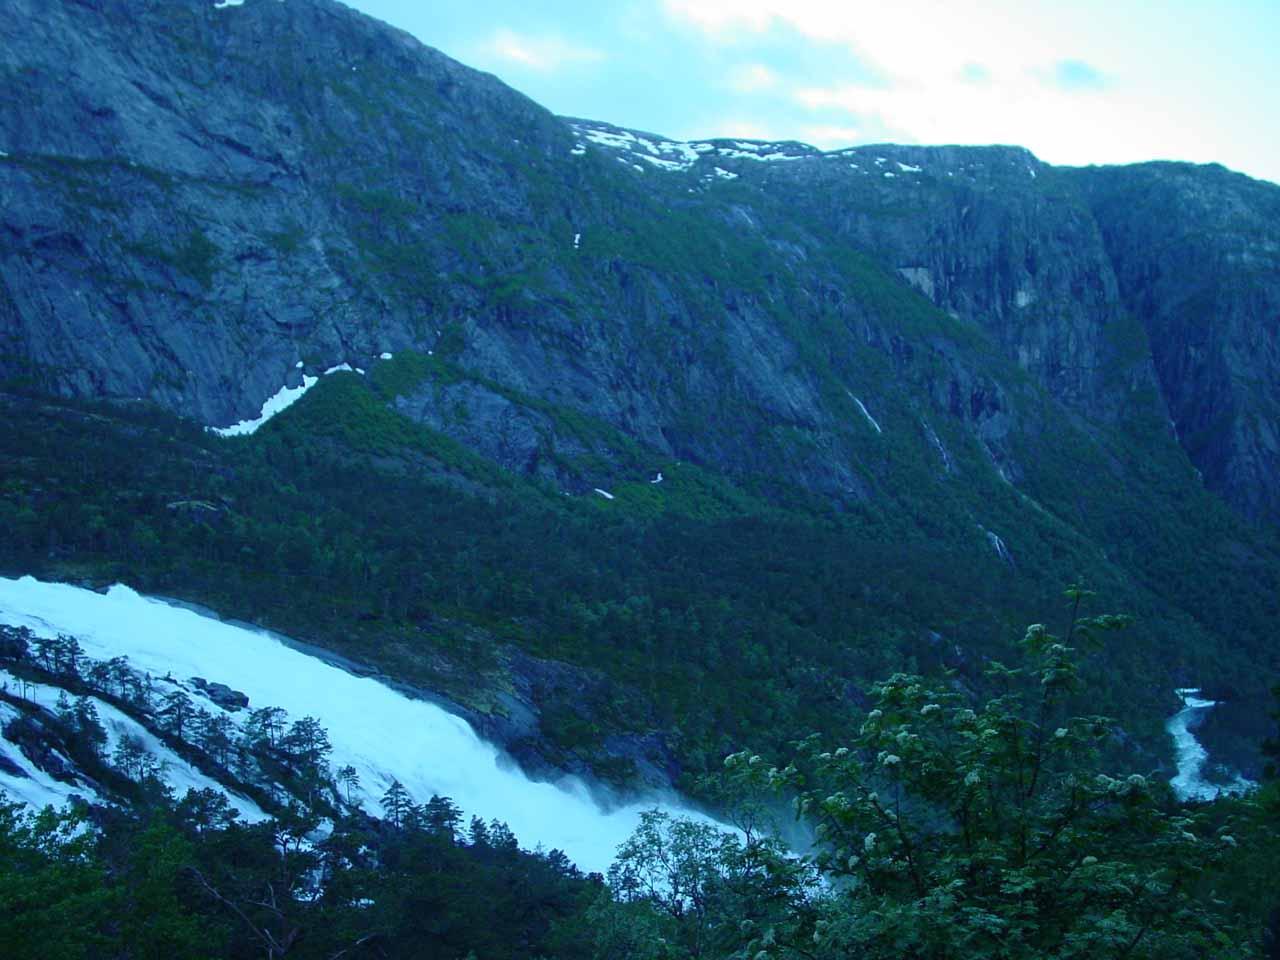 Looking downstream across the bottom part of Nyastølsfossen from the gravel road